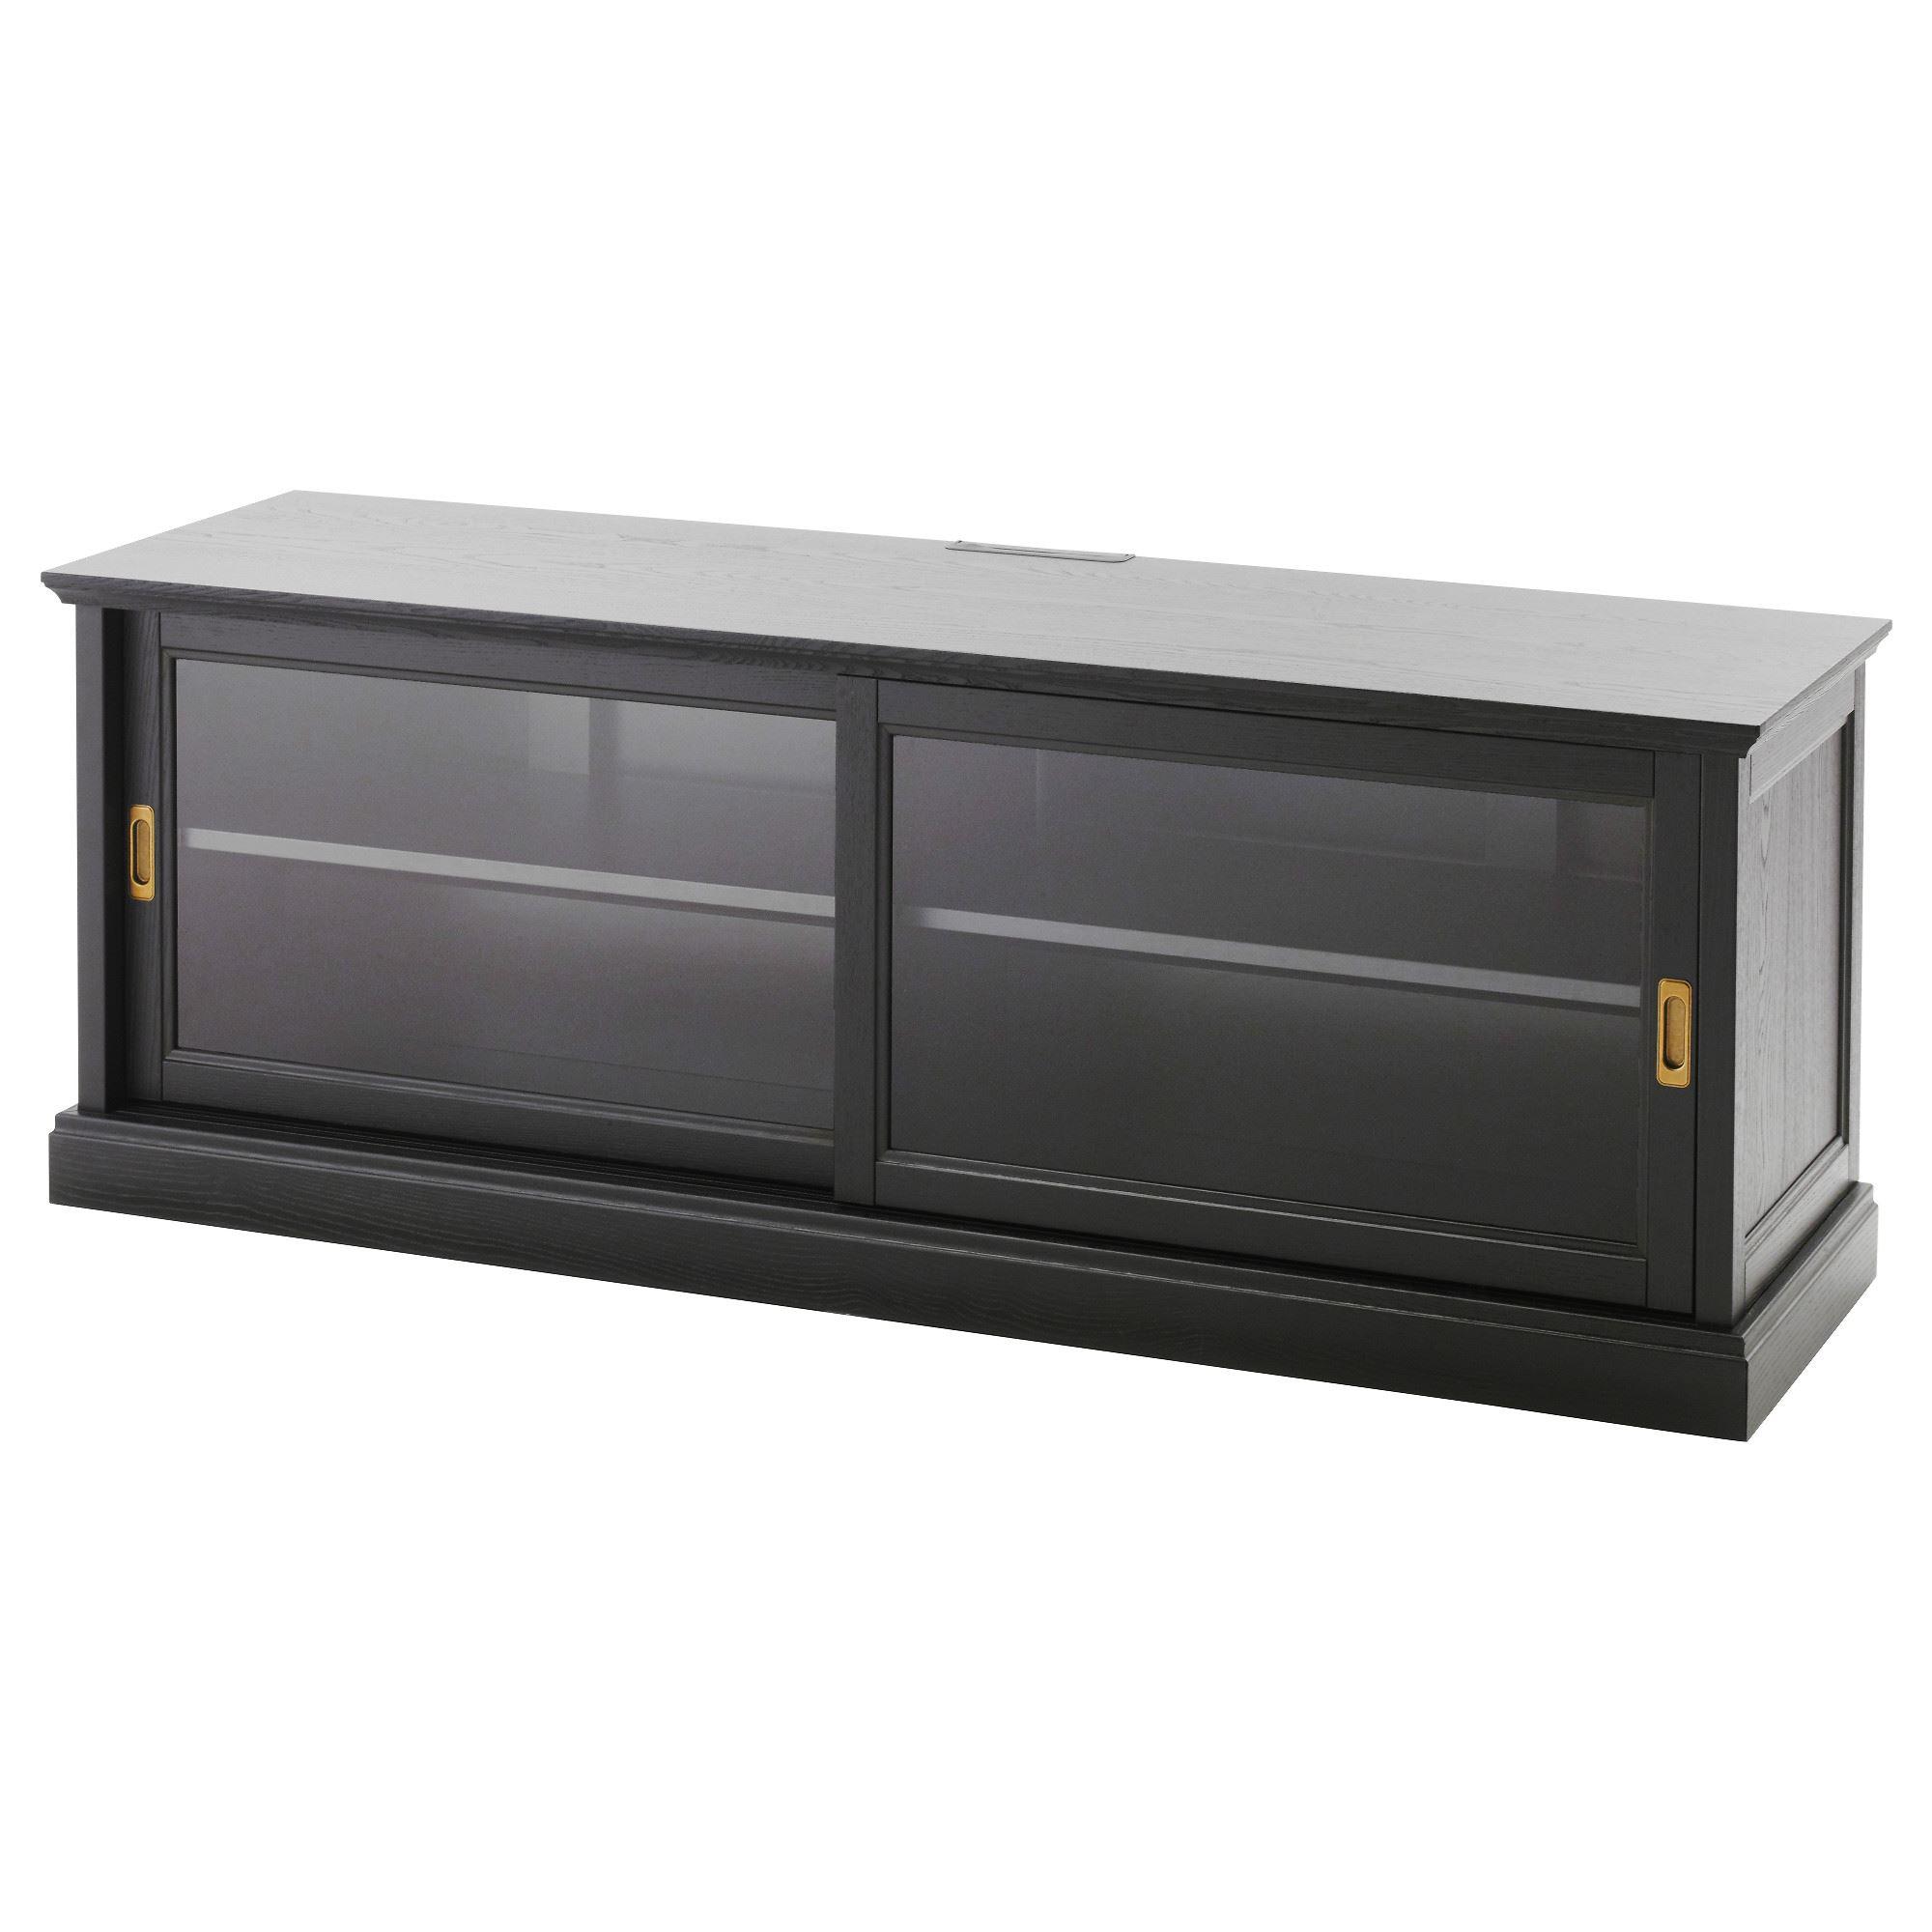 Malsjo Tv Sehpasi Siyah 160x48 Cm Ikea Tv Dolap Sistemleri